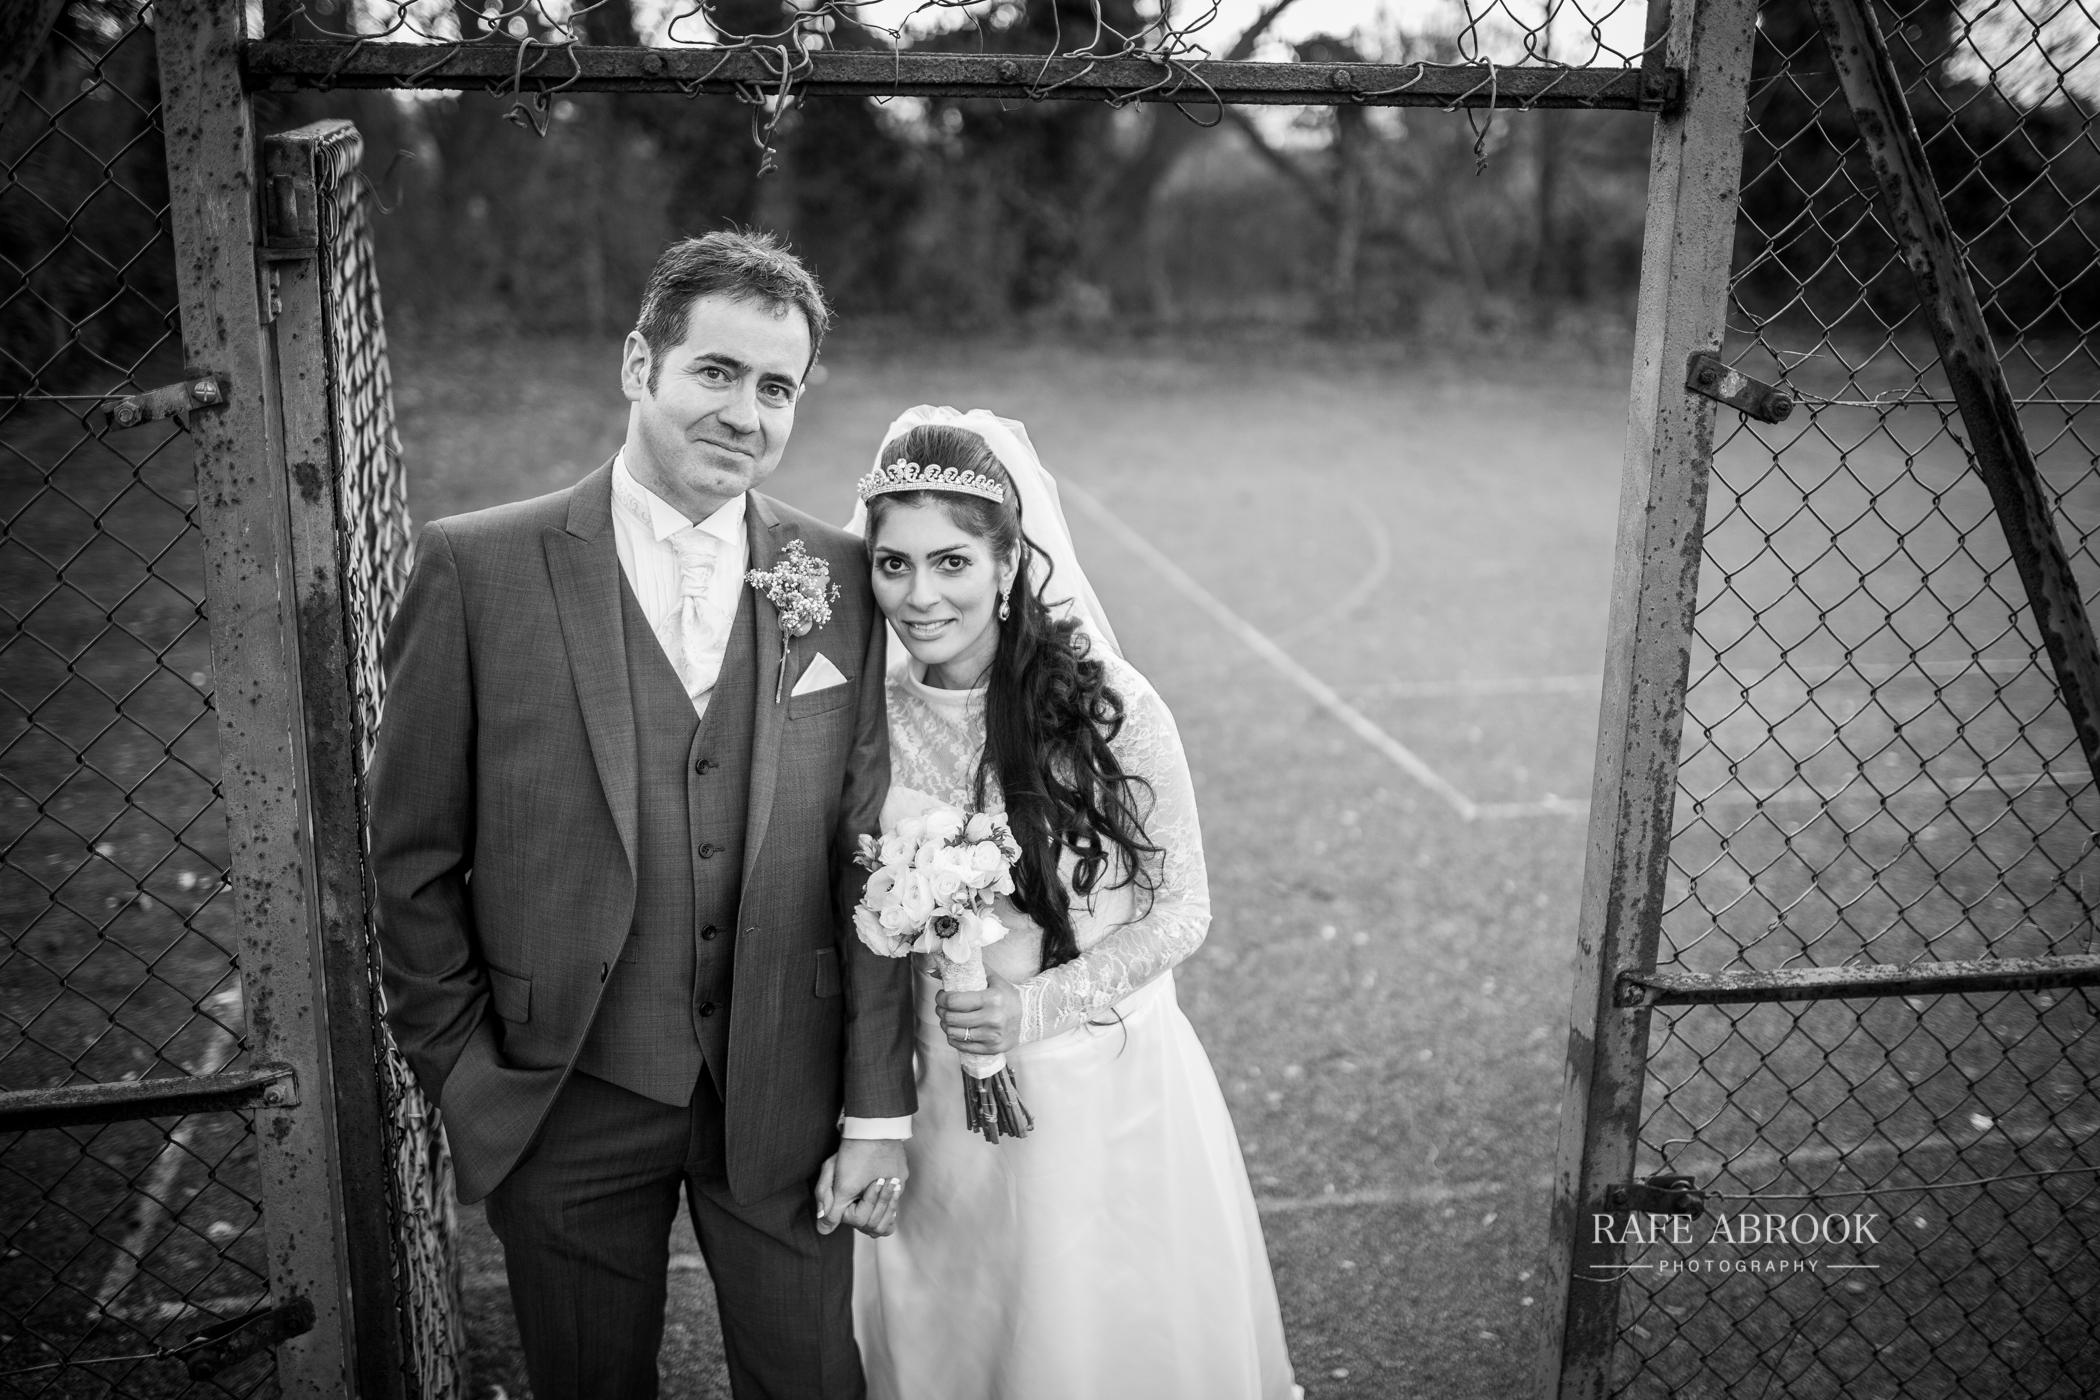 roma & pete wedding hampstead shenley hertfordshire -316.jpg